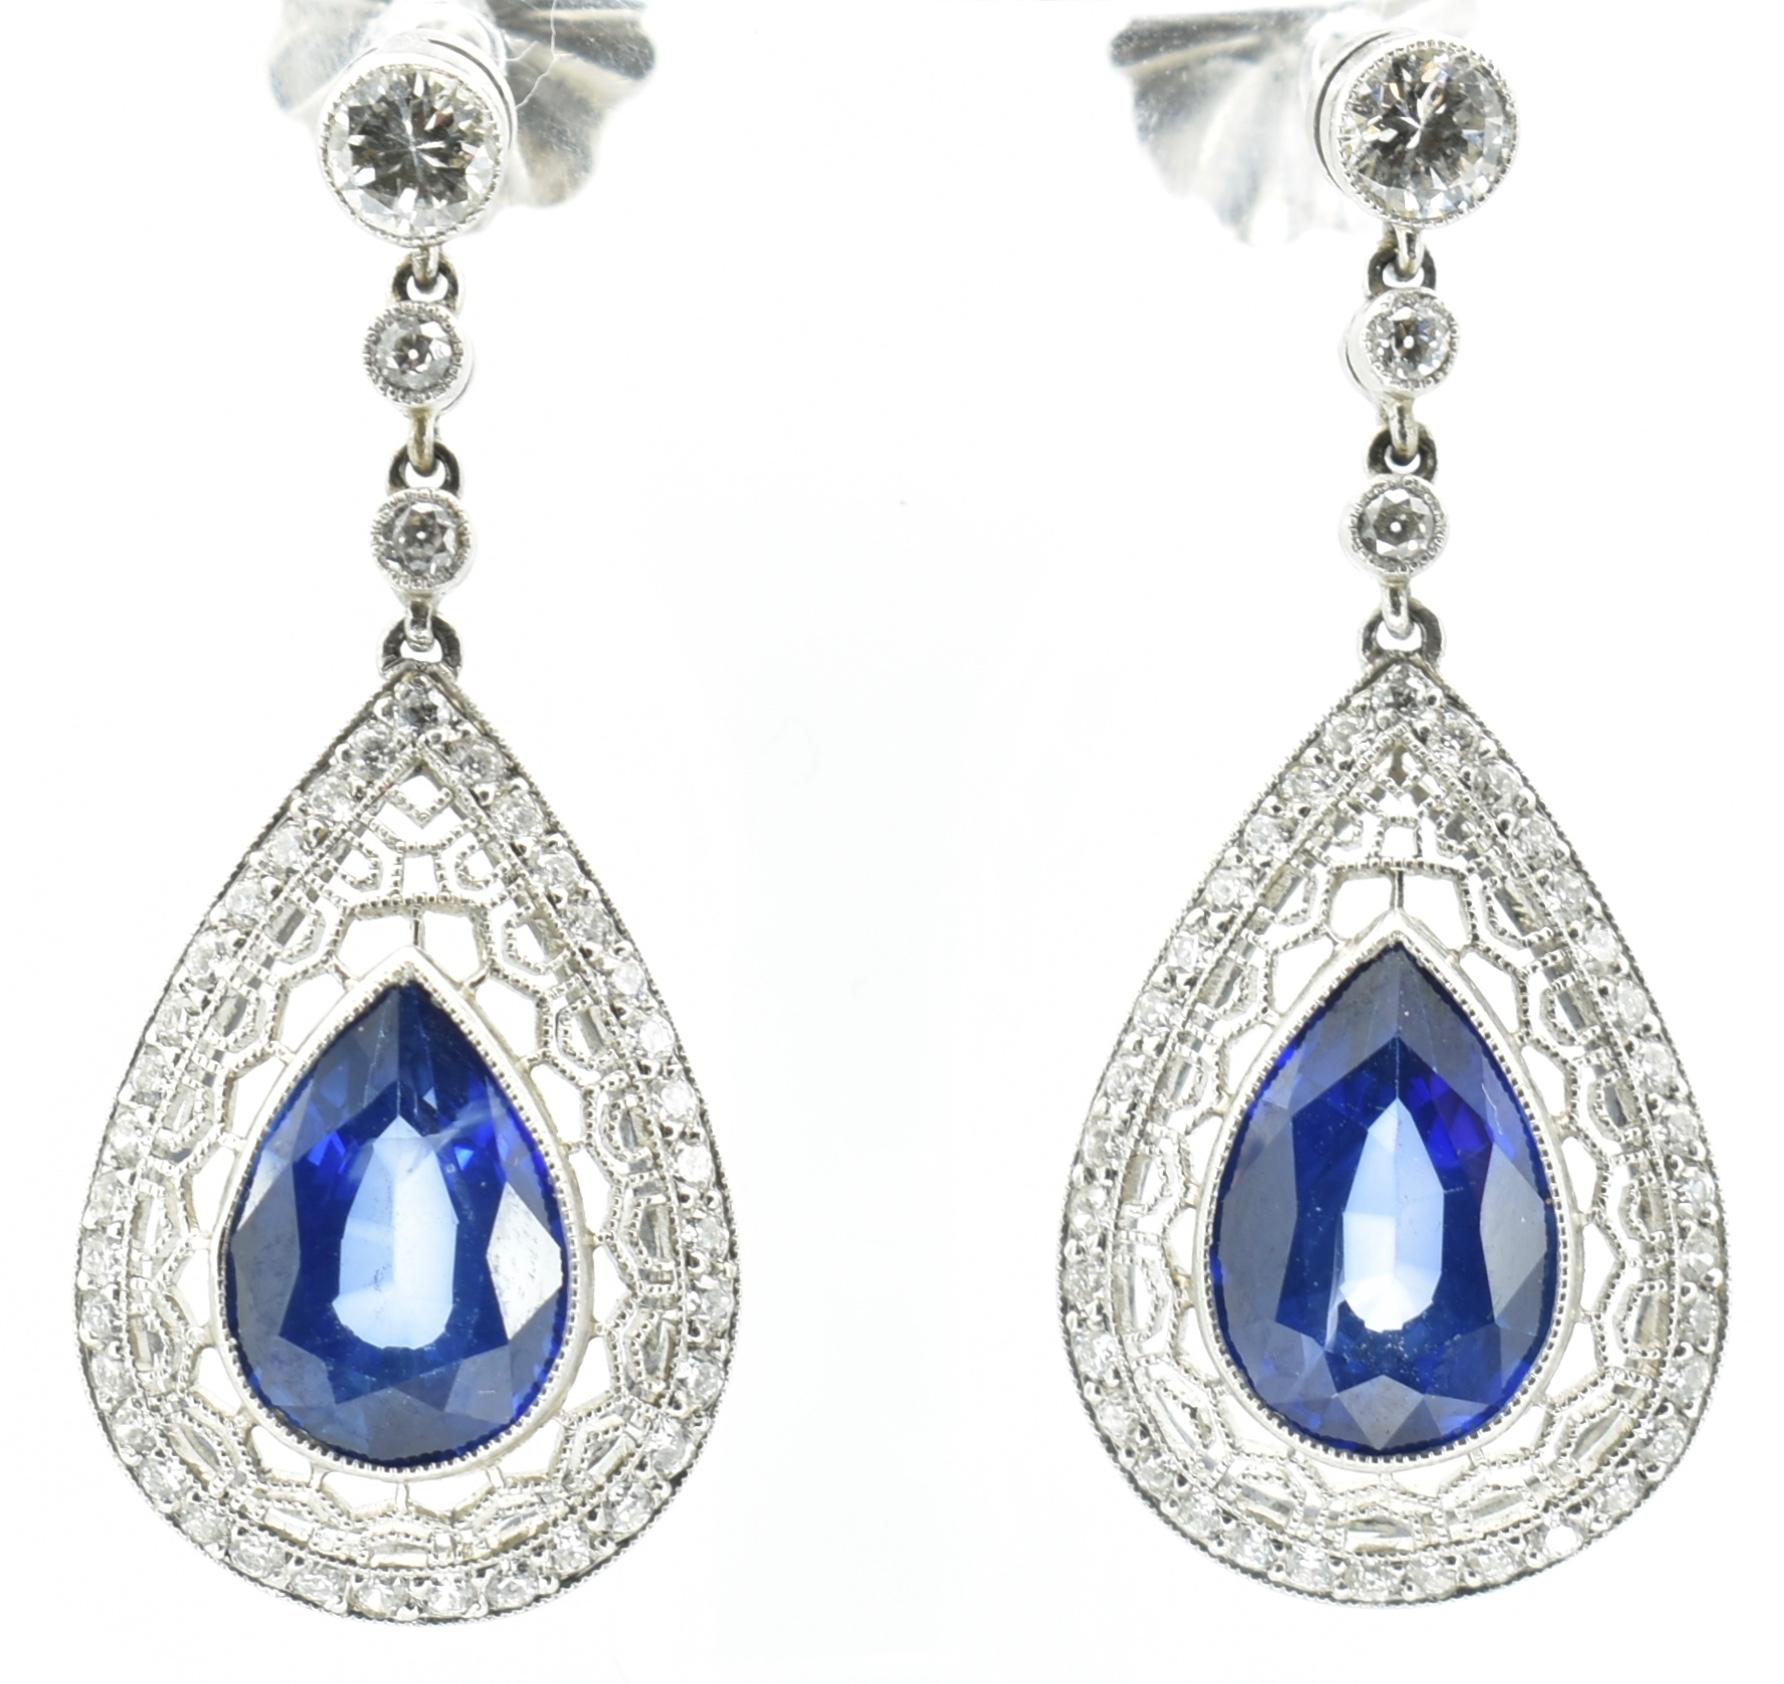 PAIR OF SAPPHIRE & DIAMOND PENDANT EARRINGS - Image 3 of 4